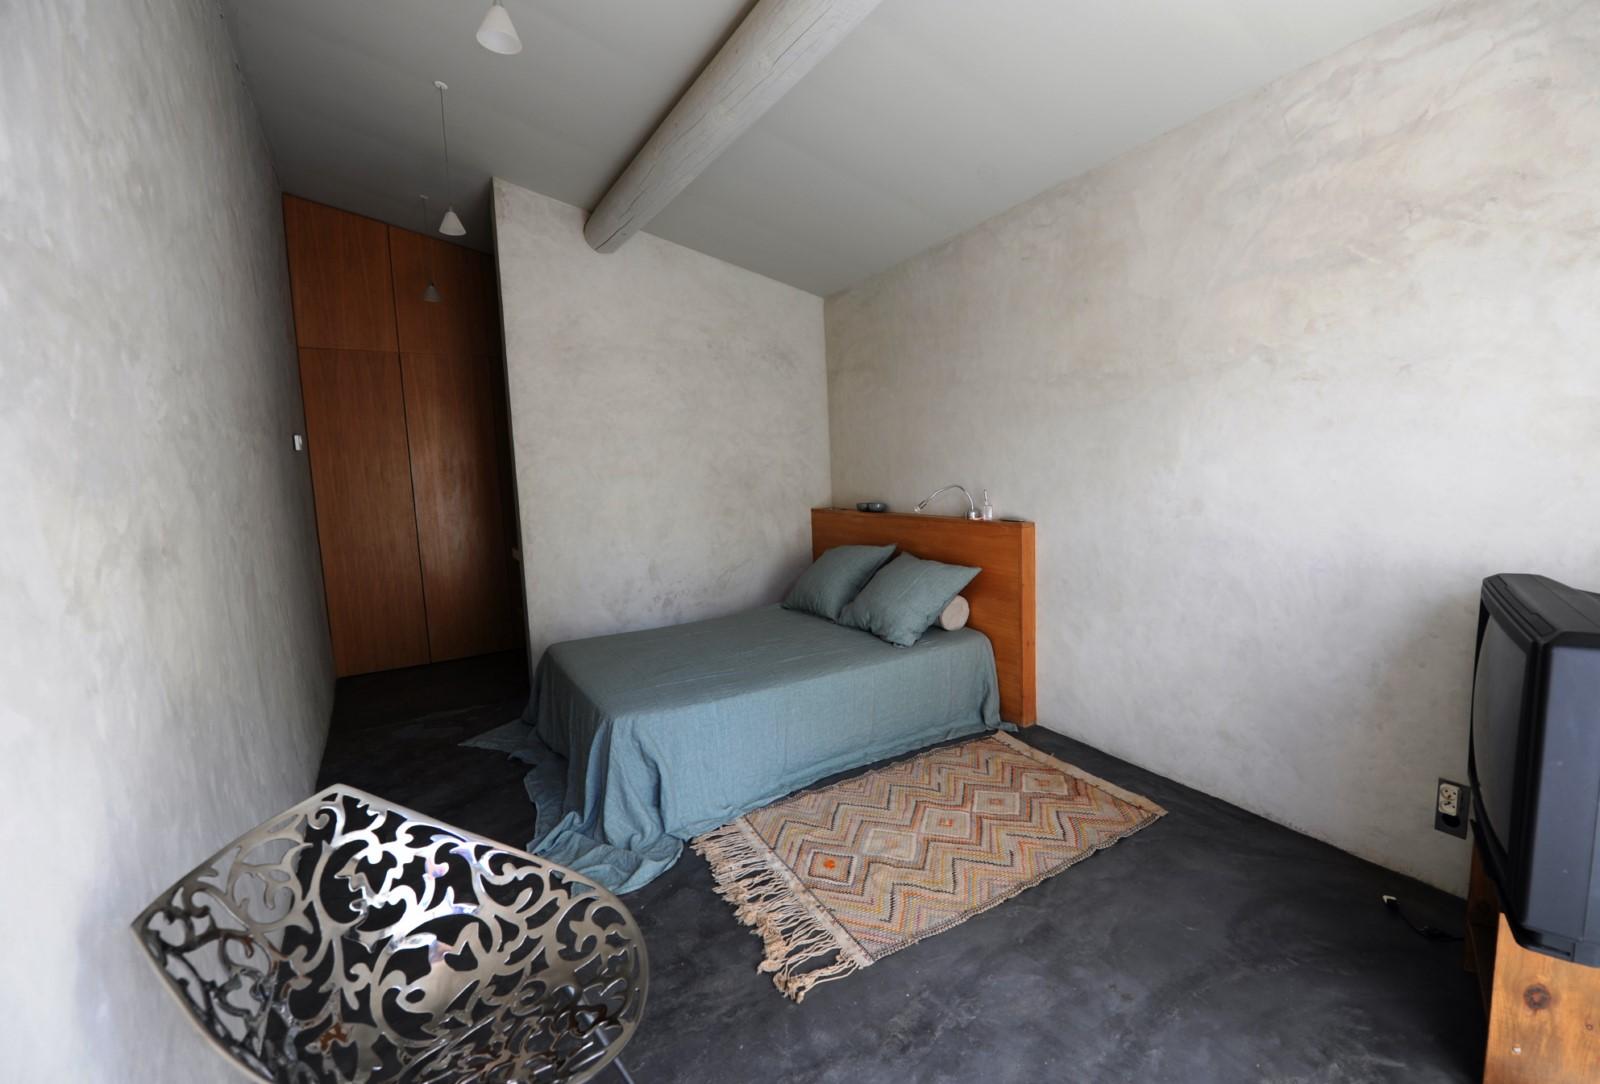 Chambre extérieure avec sauna